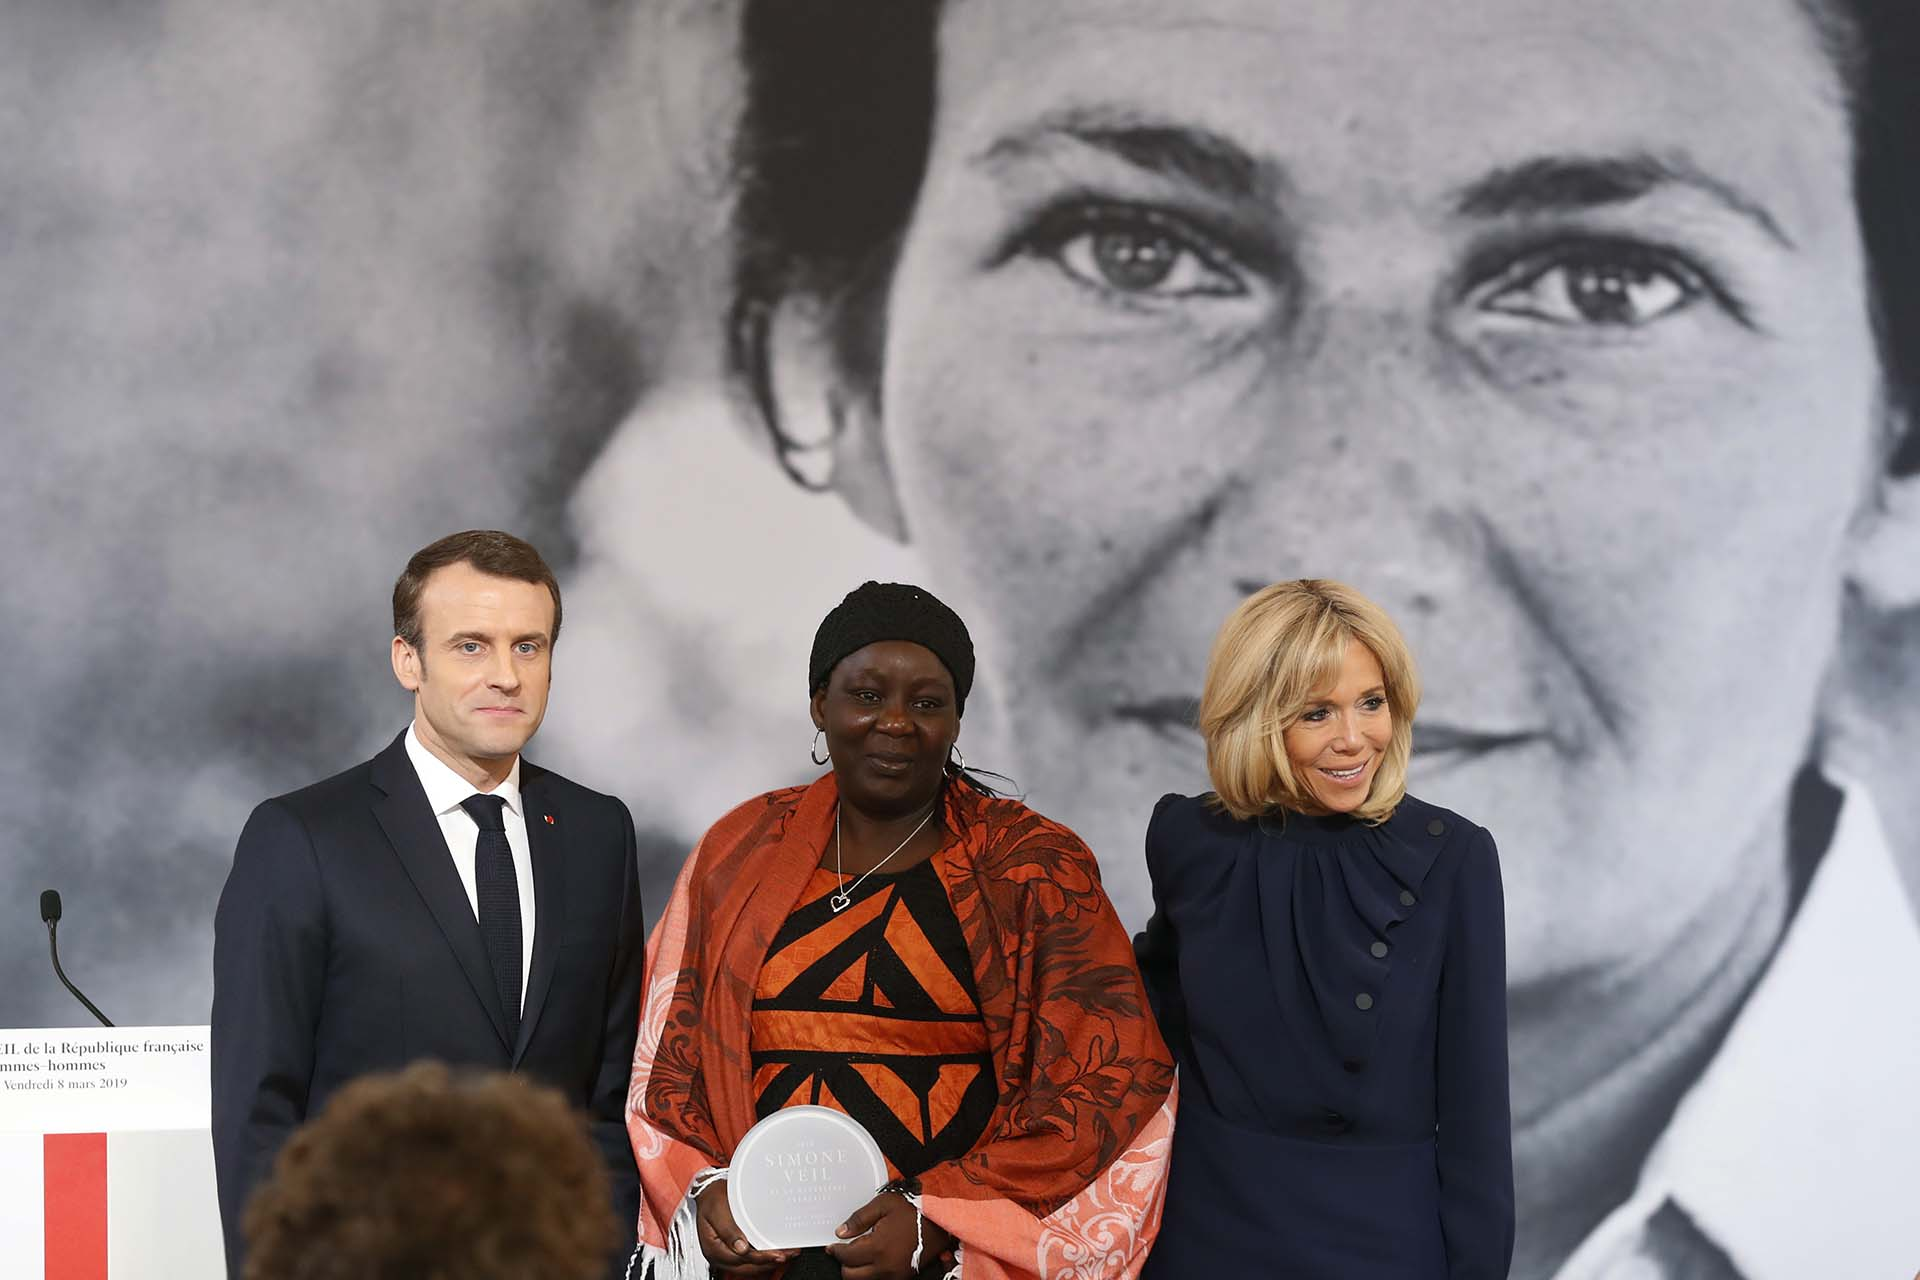 La activista camerunesa Aissa Doumara Ngatansou psoa junto al presidente francés Emmanuel Macron y su esposa, Brigitte Macron (Photo by Thibault Camus / POOL / AFP)